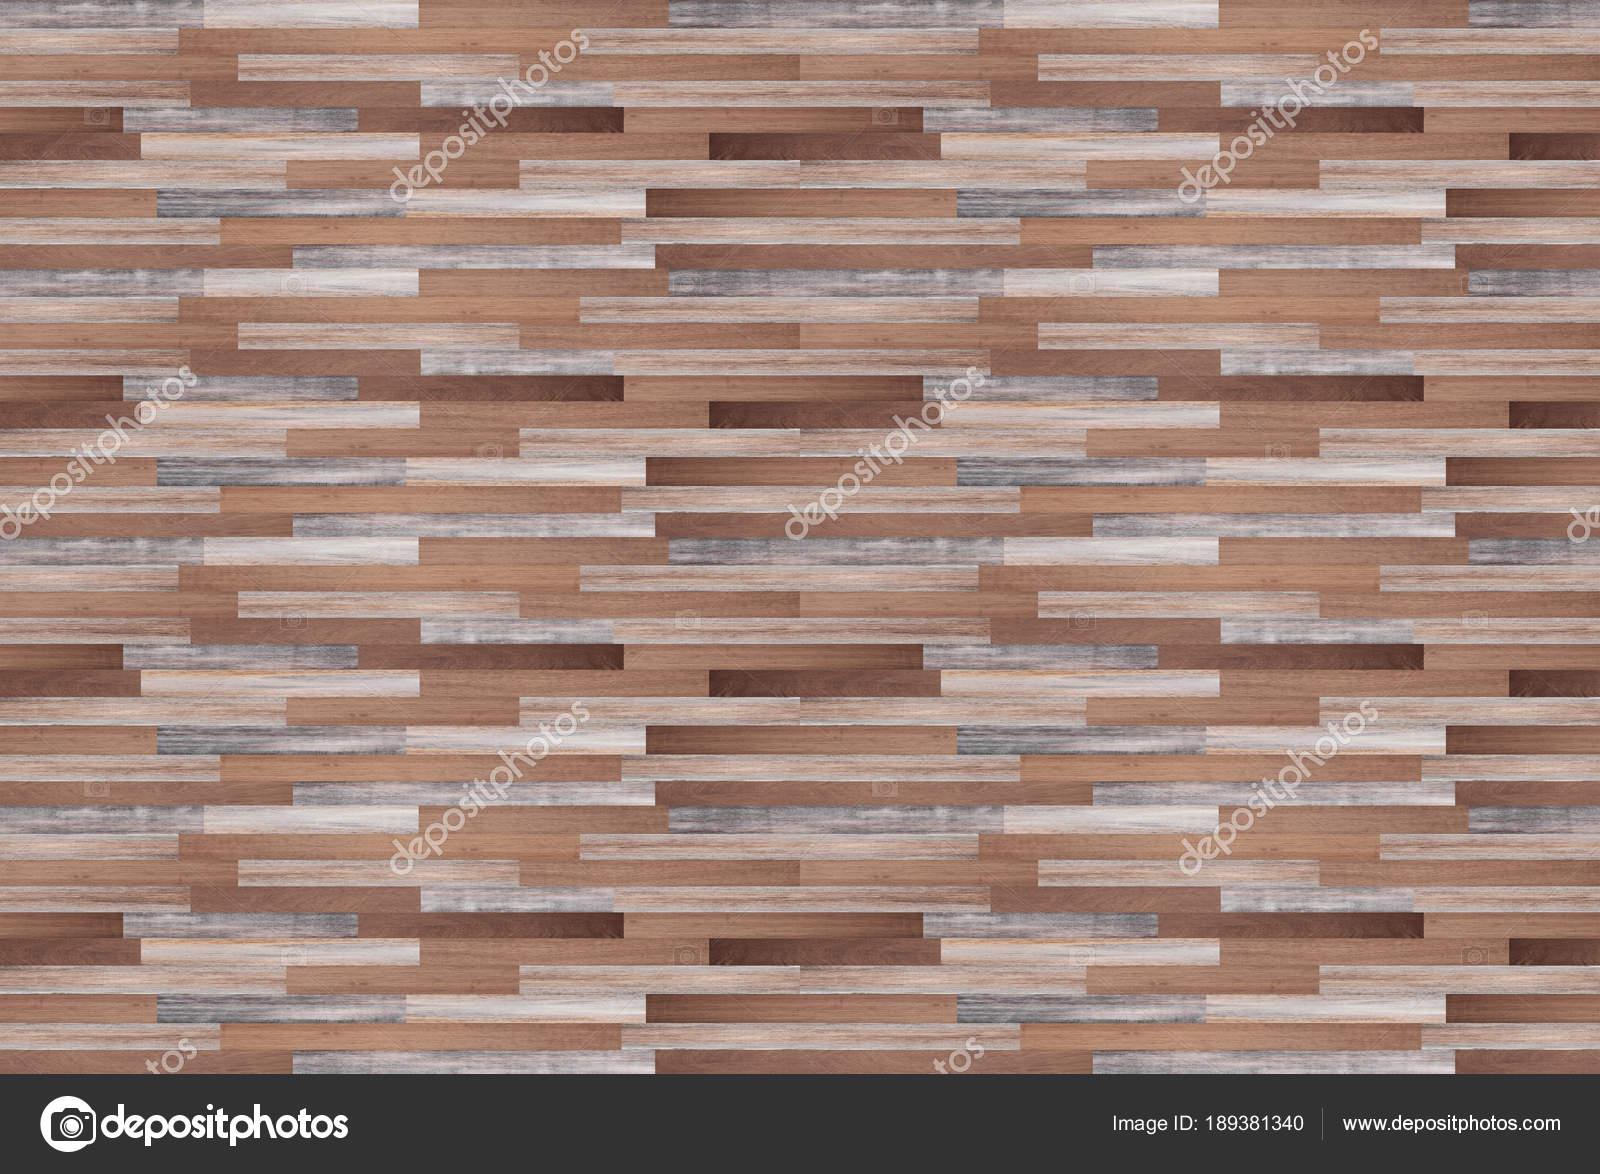 Fußboden Aus Holzklötzen ~ Holzstruktur hintergrund nahtlose hartholz fußboden u stockfoto